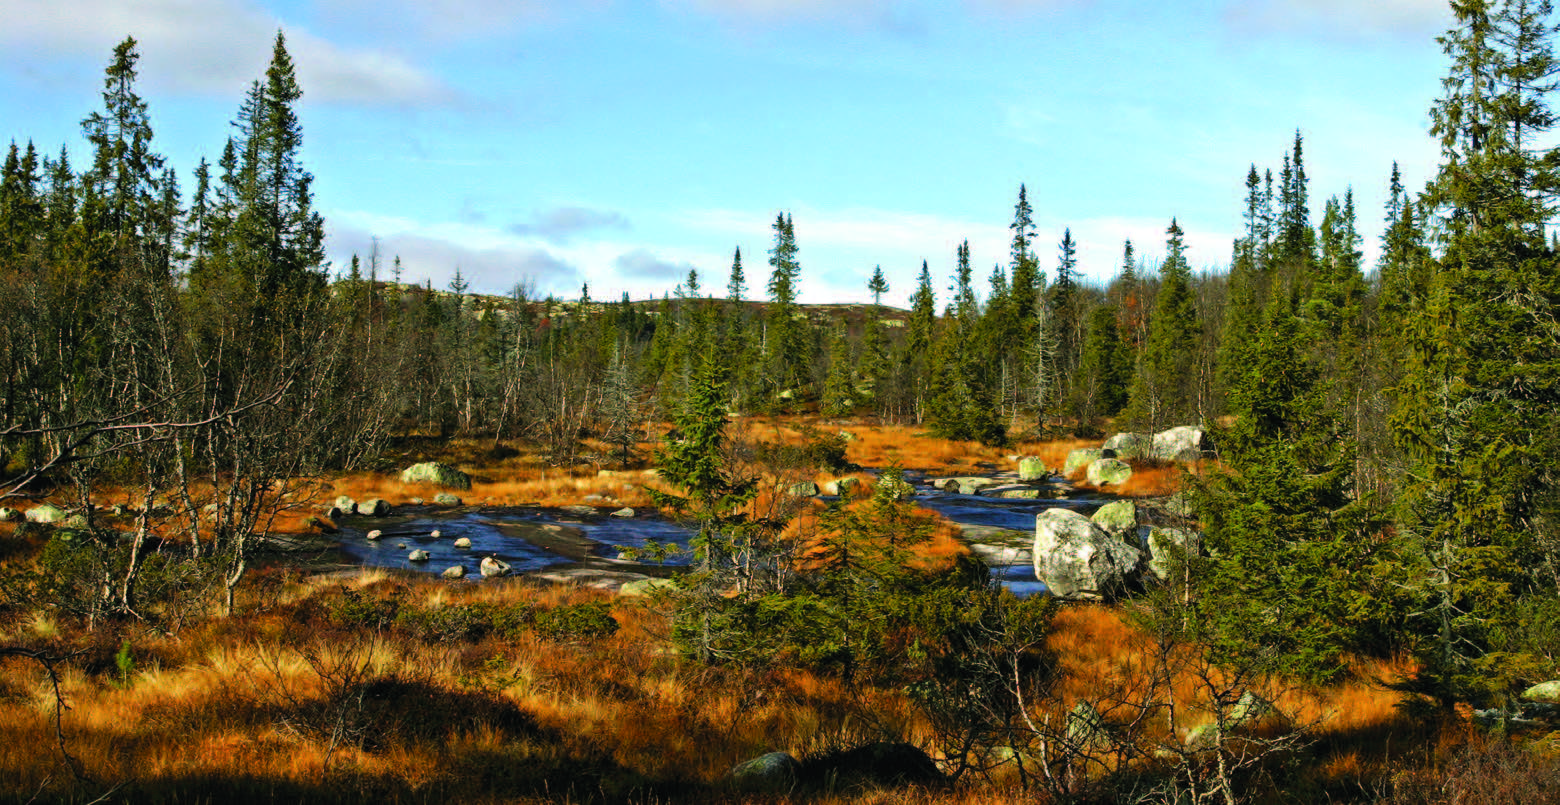 Vernskog tjener til vern for annen skog. Skog opp mot fjellet er sårbar og vernskogen skal forvaltes slik at skoggrensa stabiliseres. Hedalen, Oppland. Foto: John Yngvar Larsson, NIBIO